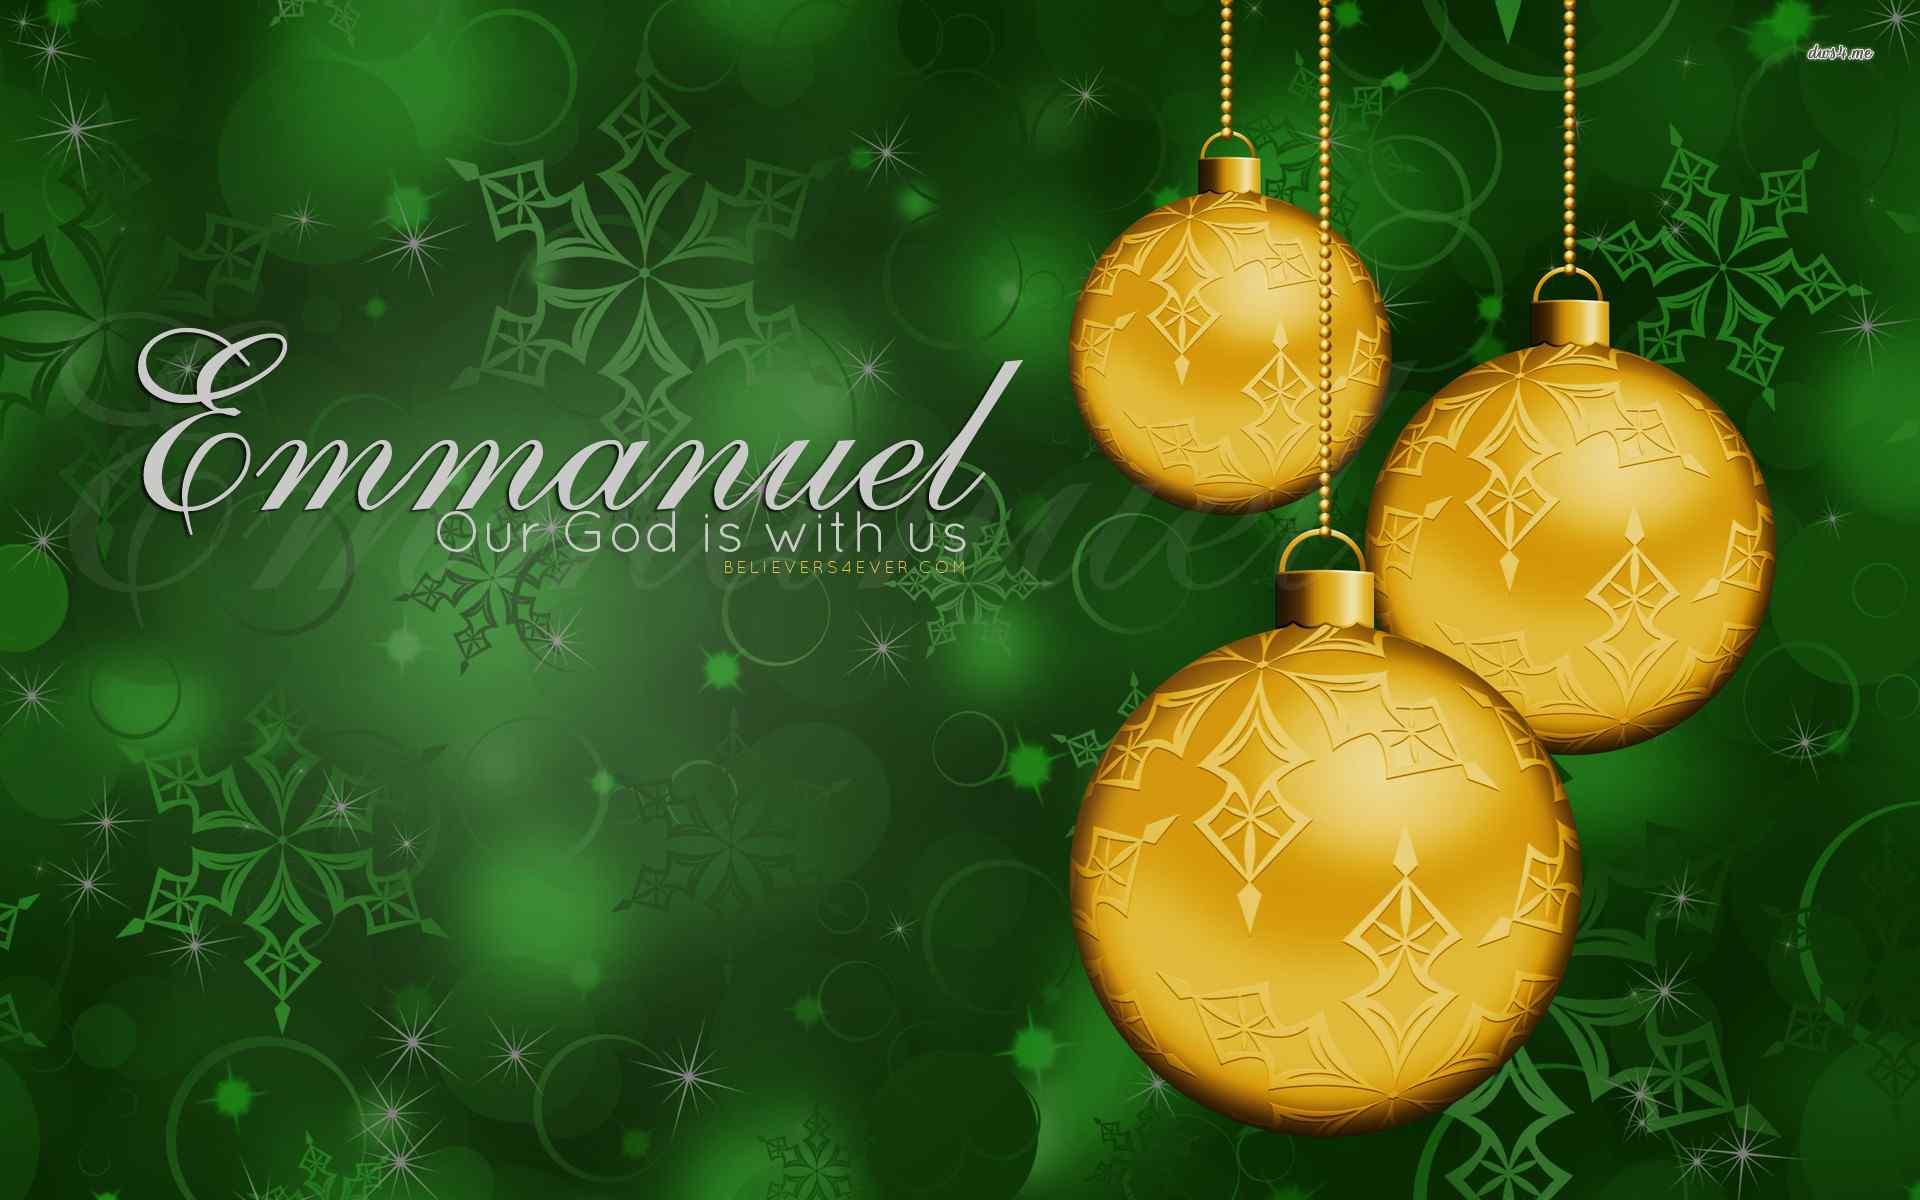 Christmas Background Christian.Beautiful Christian Christmas Desktop Wallpapers Top Free